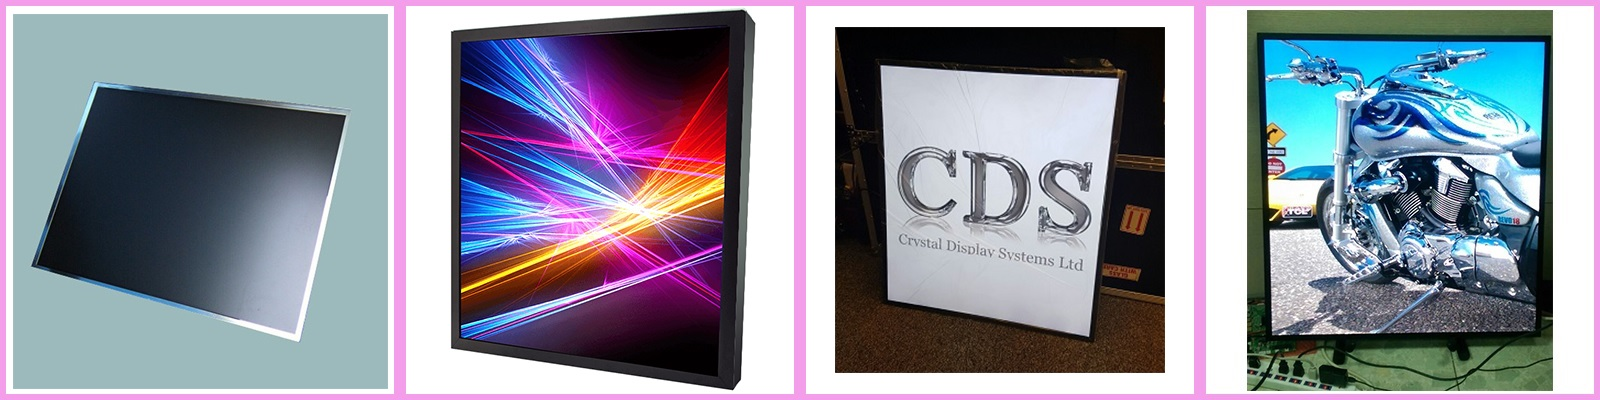 square displays cds